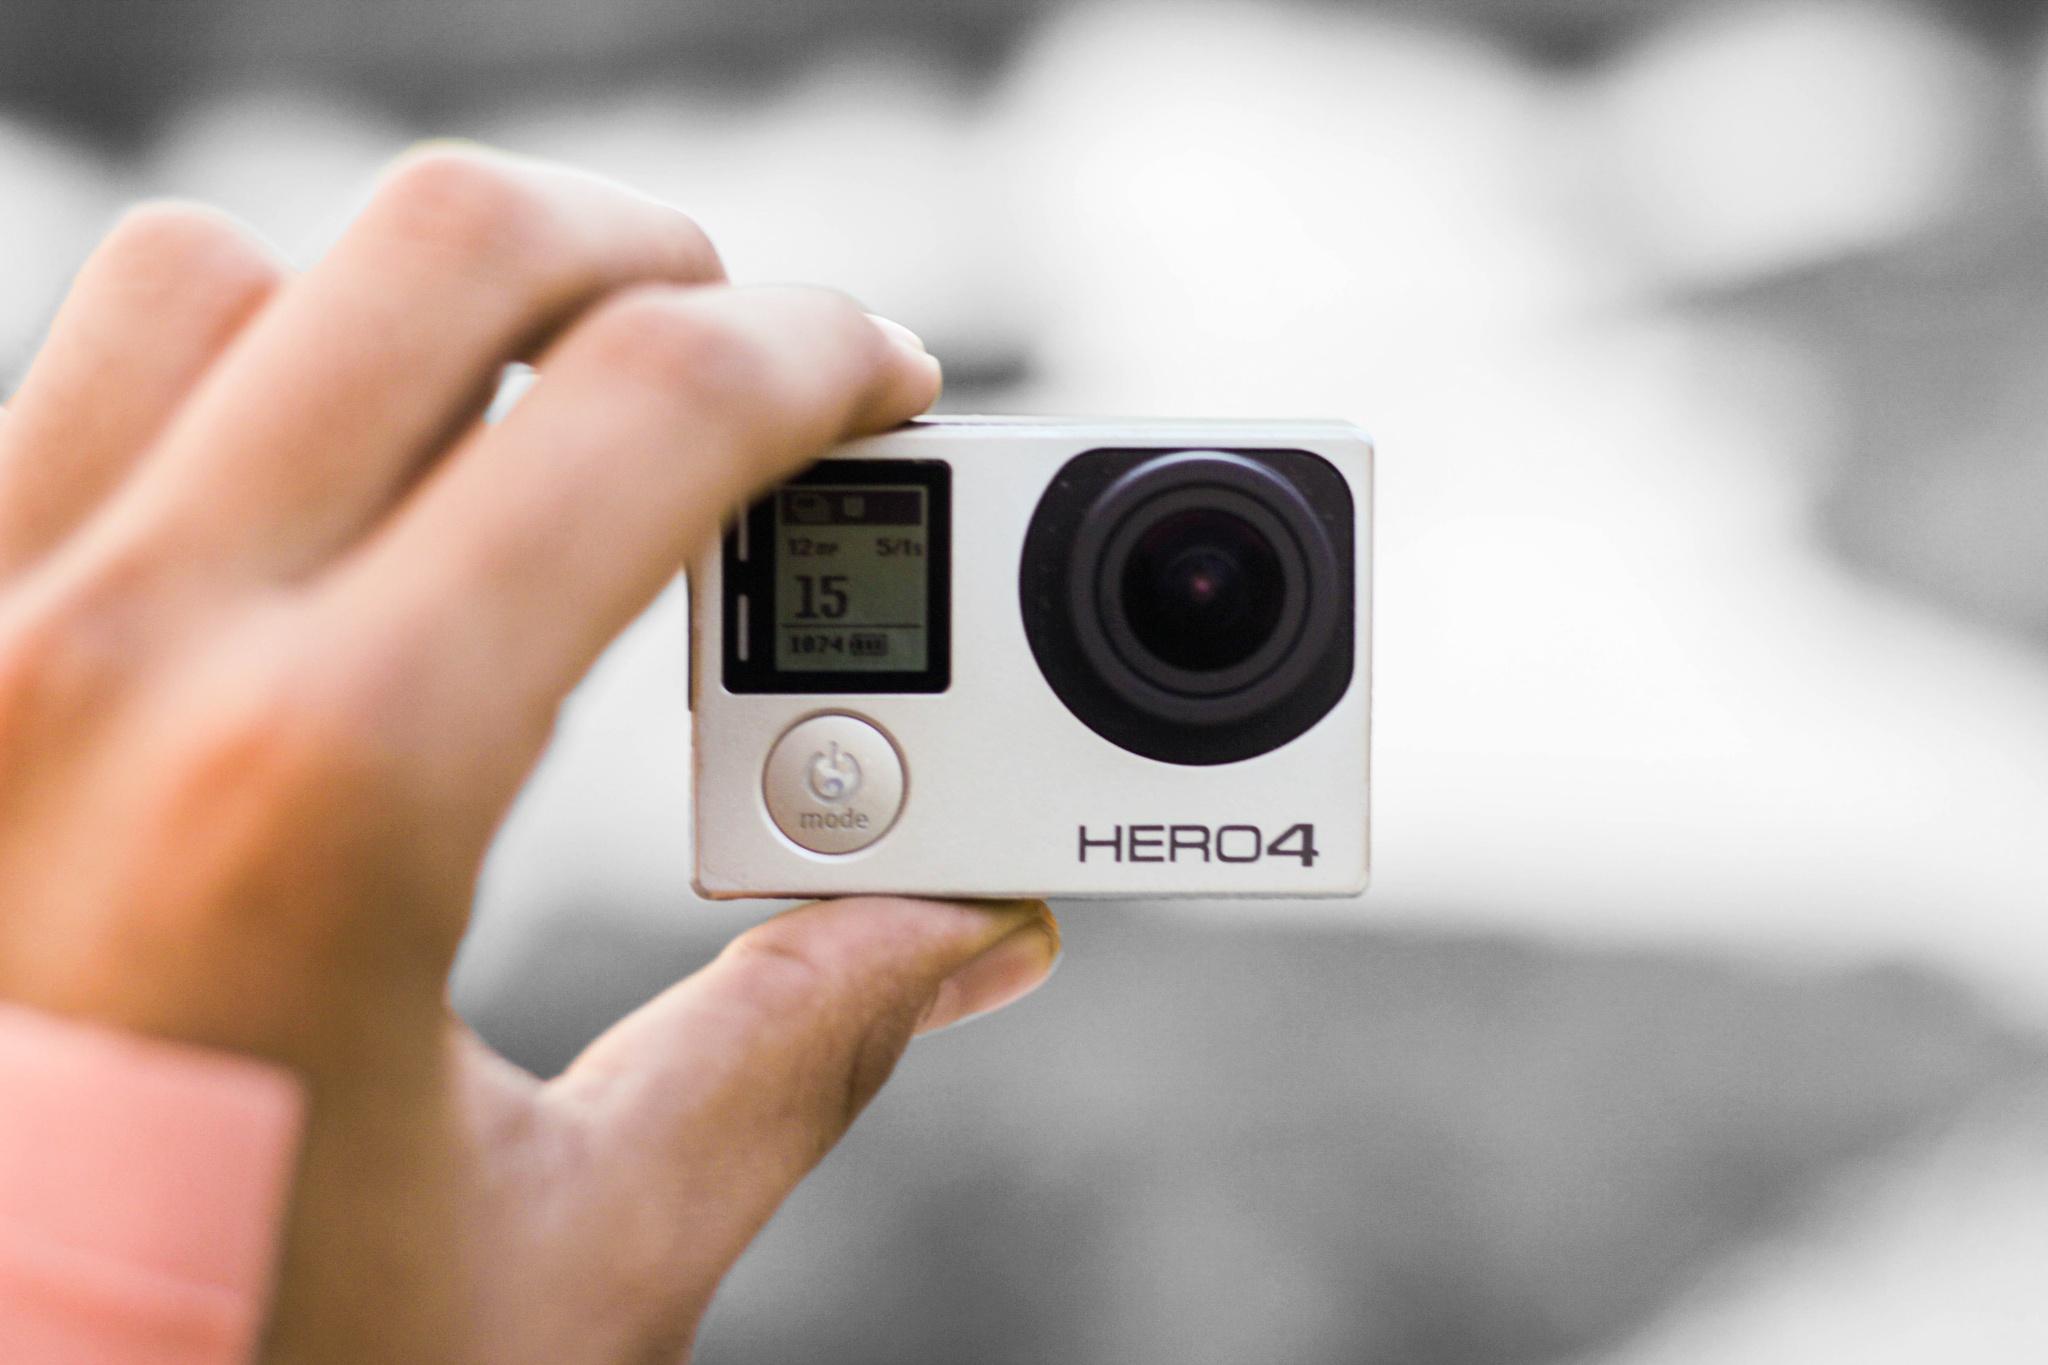 GoPro Hero 4 SilverEdition. by Muhd Munawir